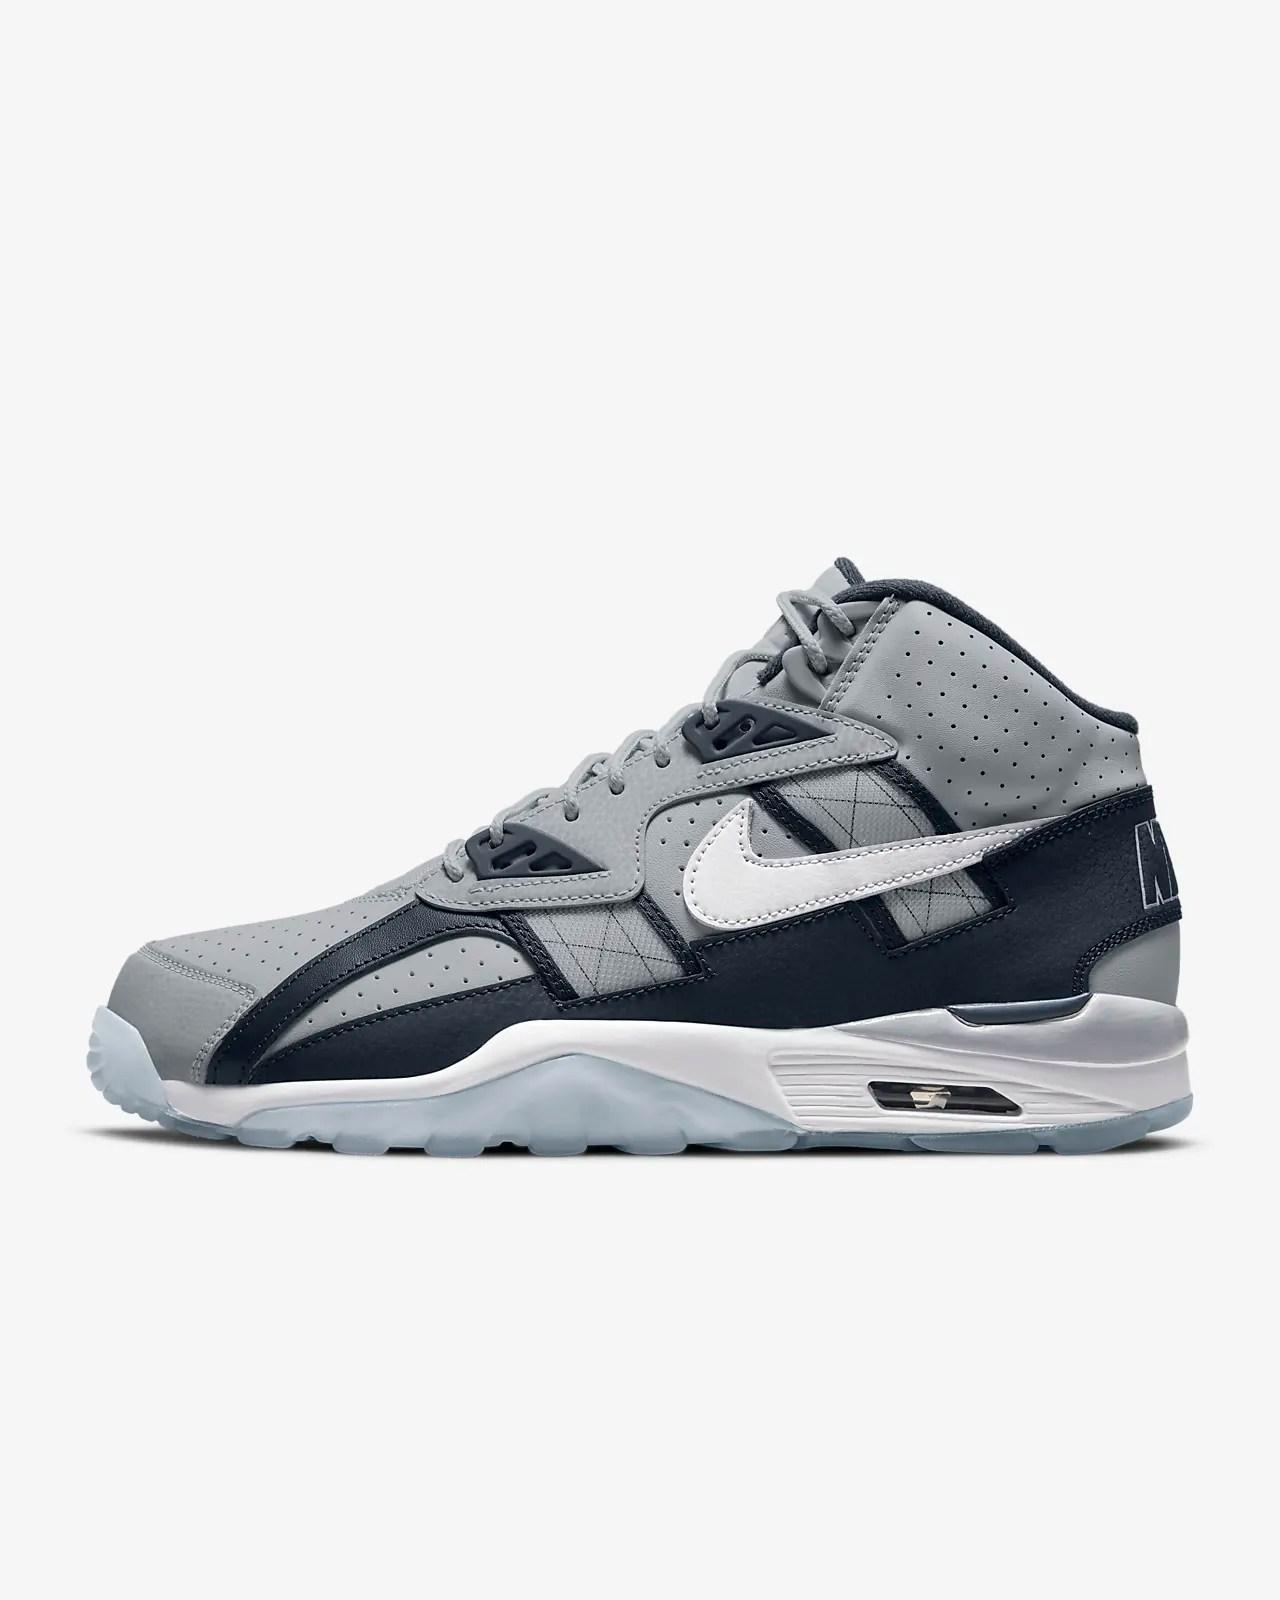 Nike Air Trainer SC High Men's Shoes